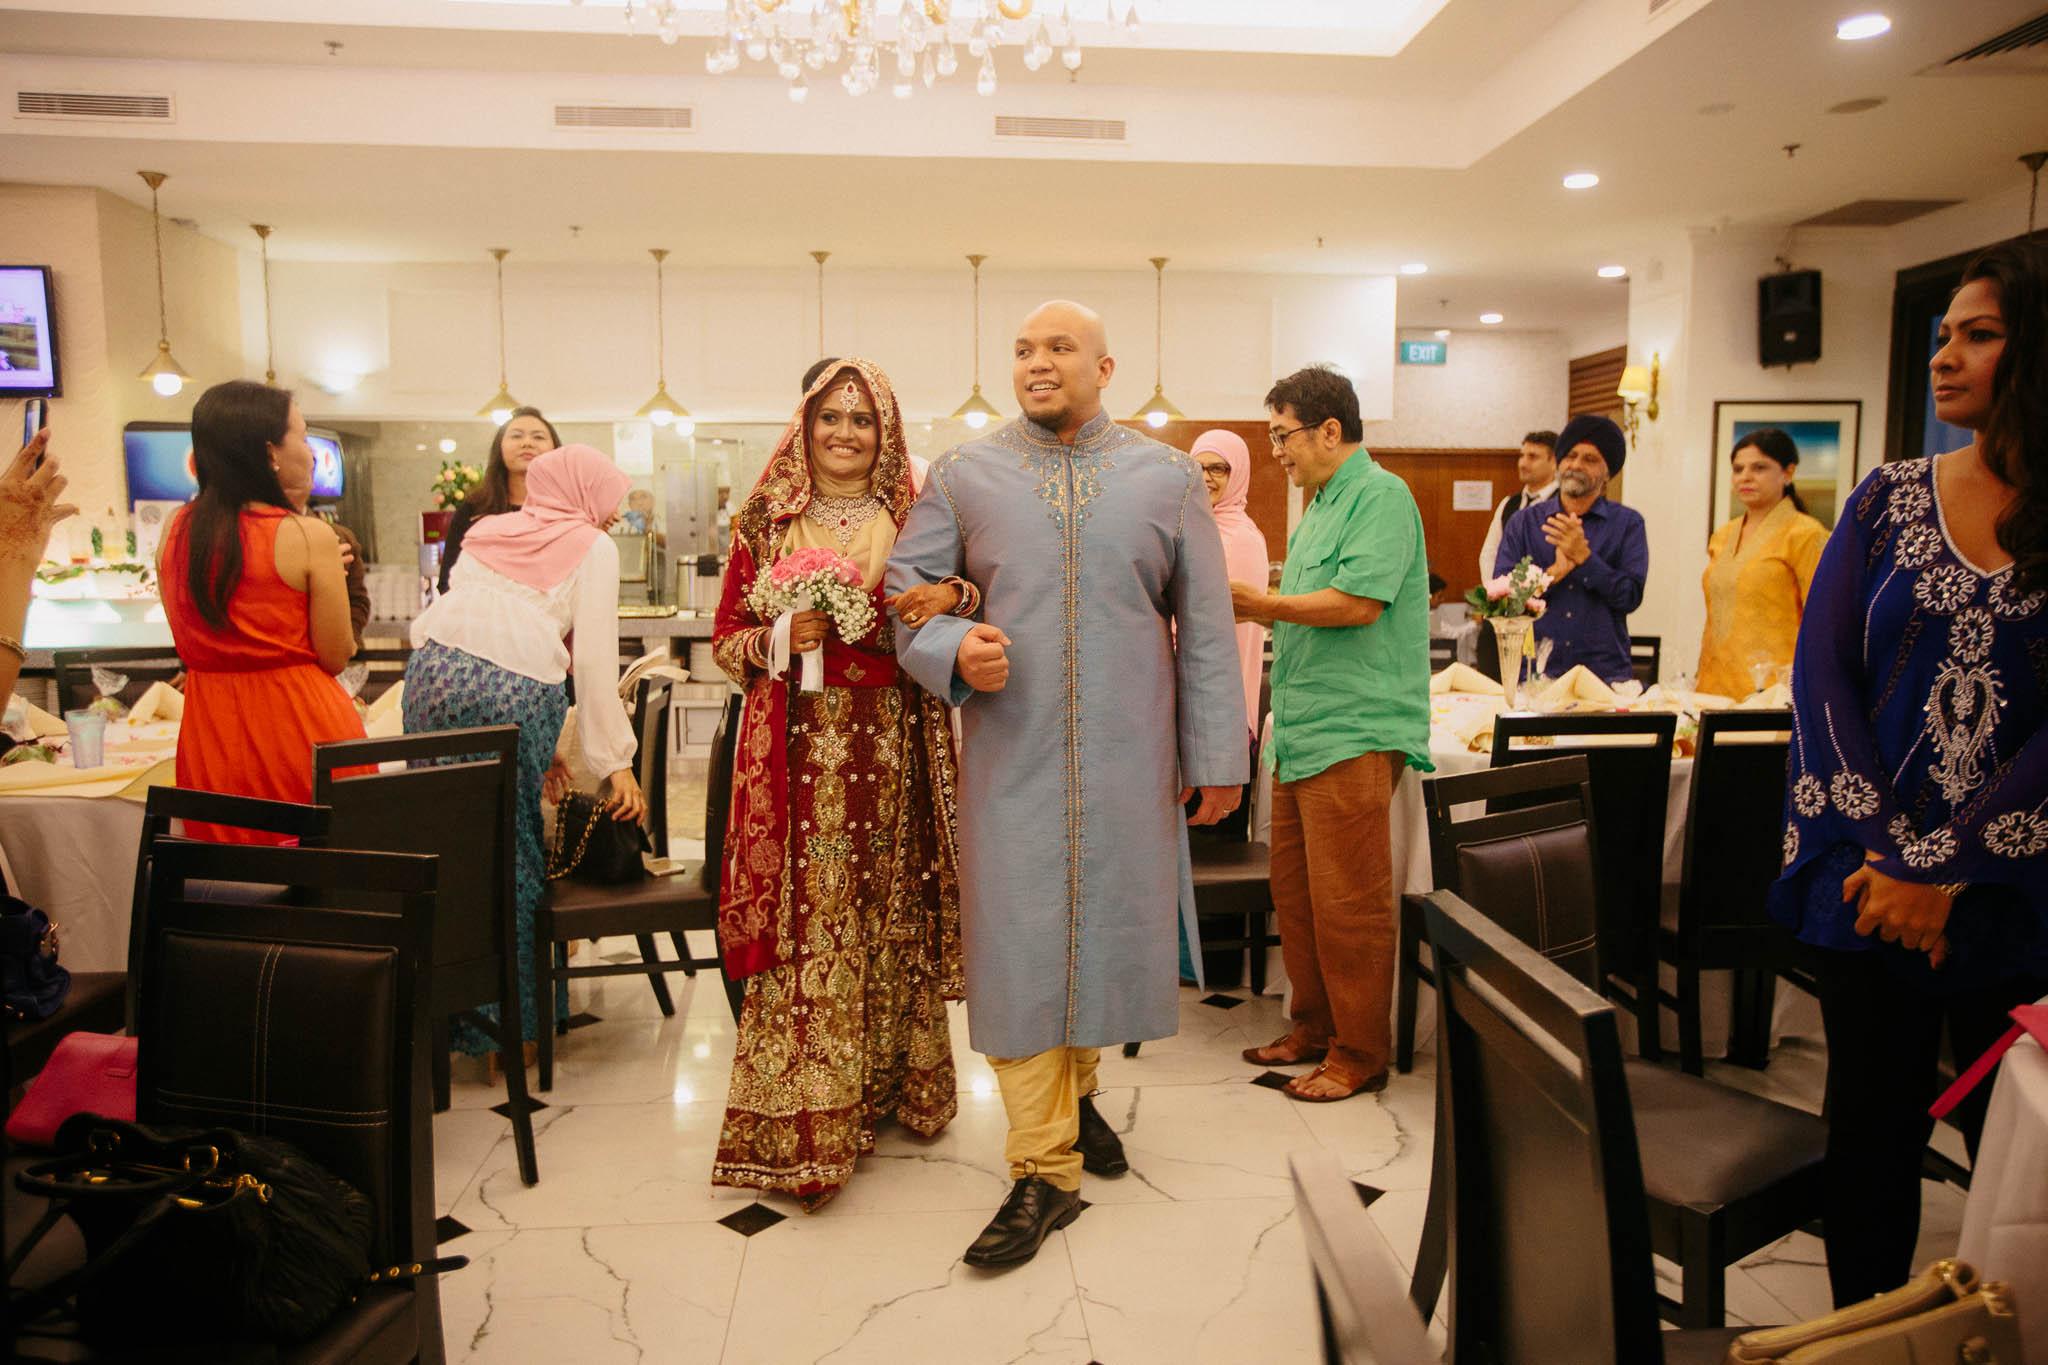 singapore-wedding-photographer-malay-indian-pre-wedding-travel-wmt-2015-shereen-farid-52.jpg